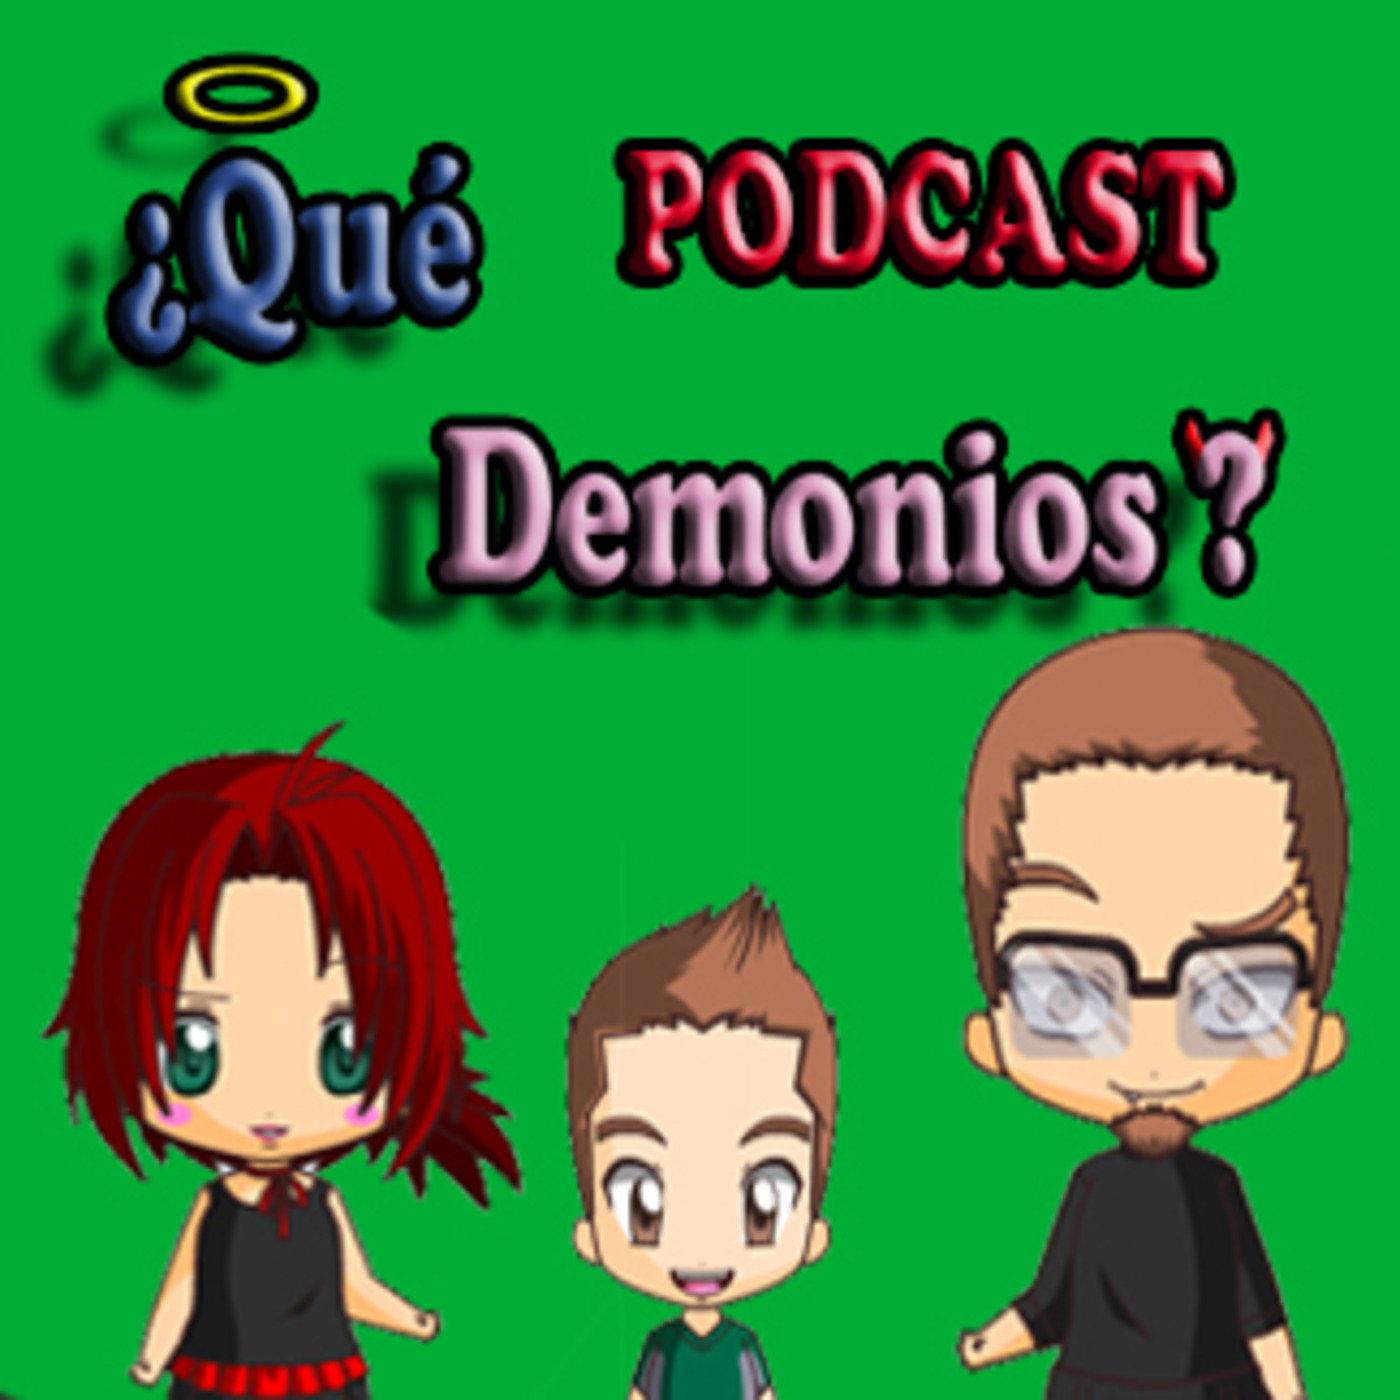 <![CDATA[¿Qué Demonios? Podcast]]>